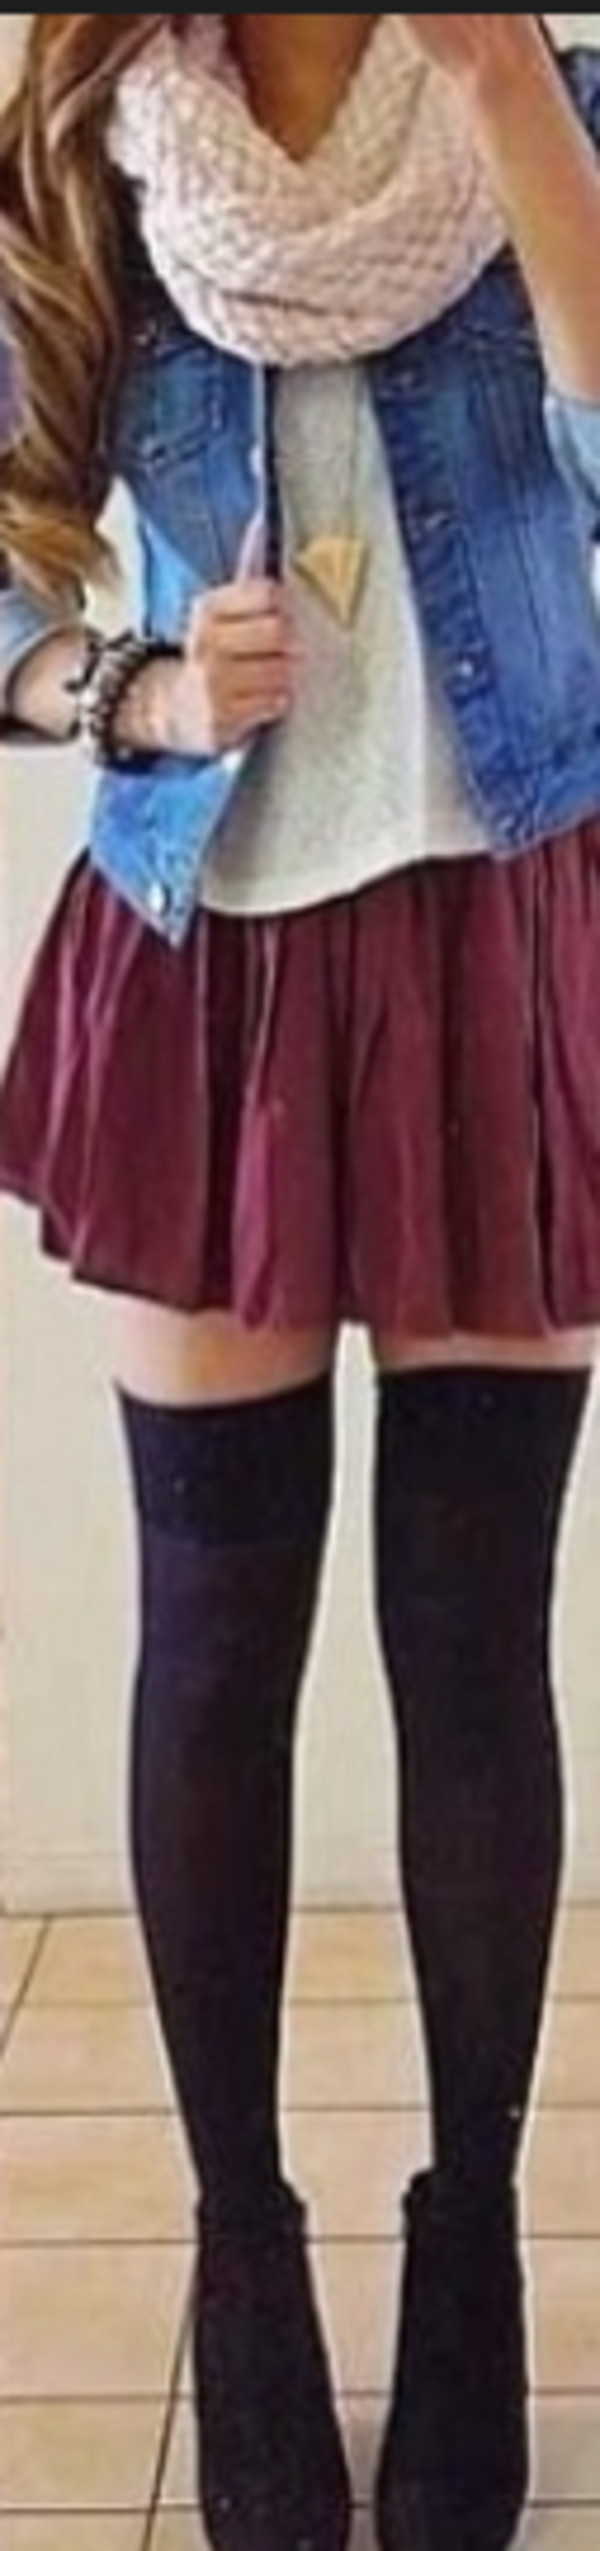 skirt jewels scarf shoes socks tights t-shirt jacket